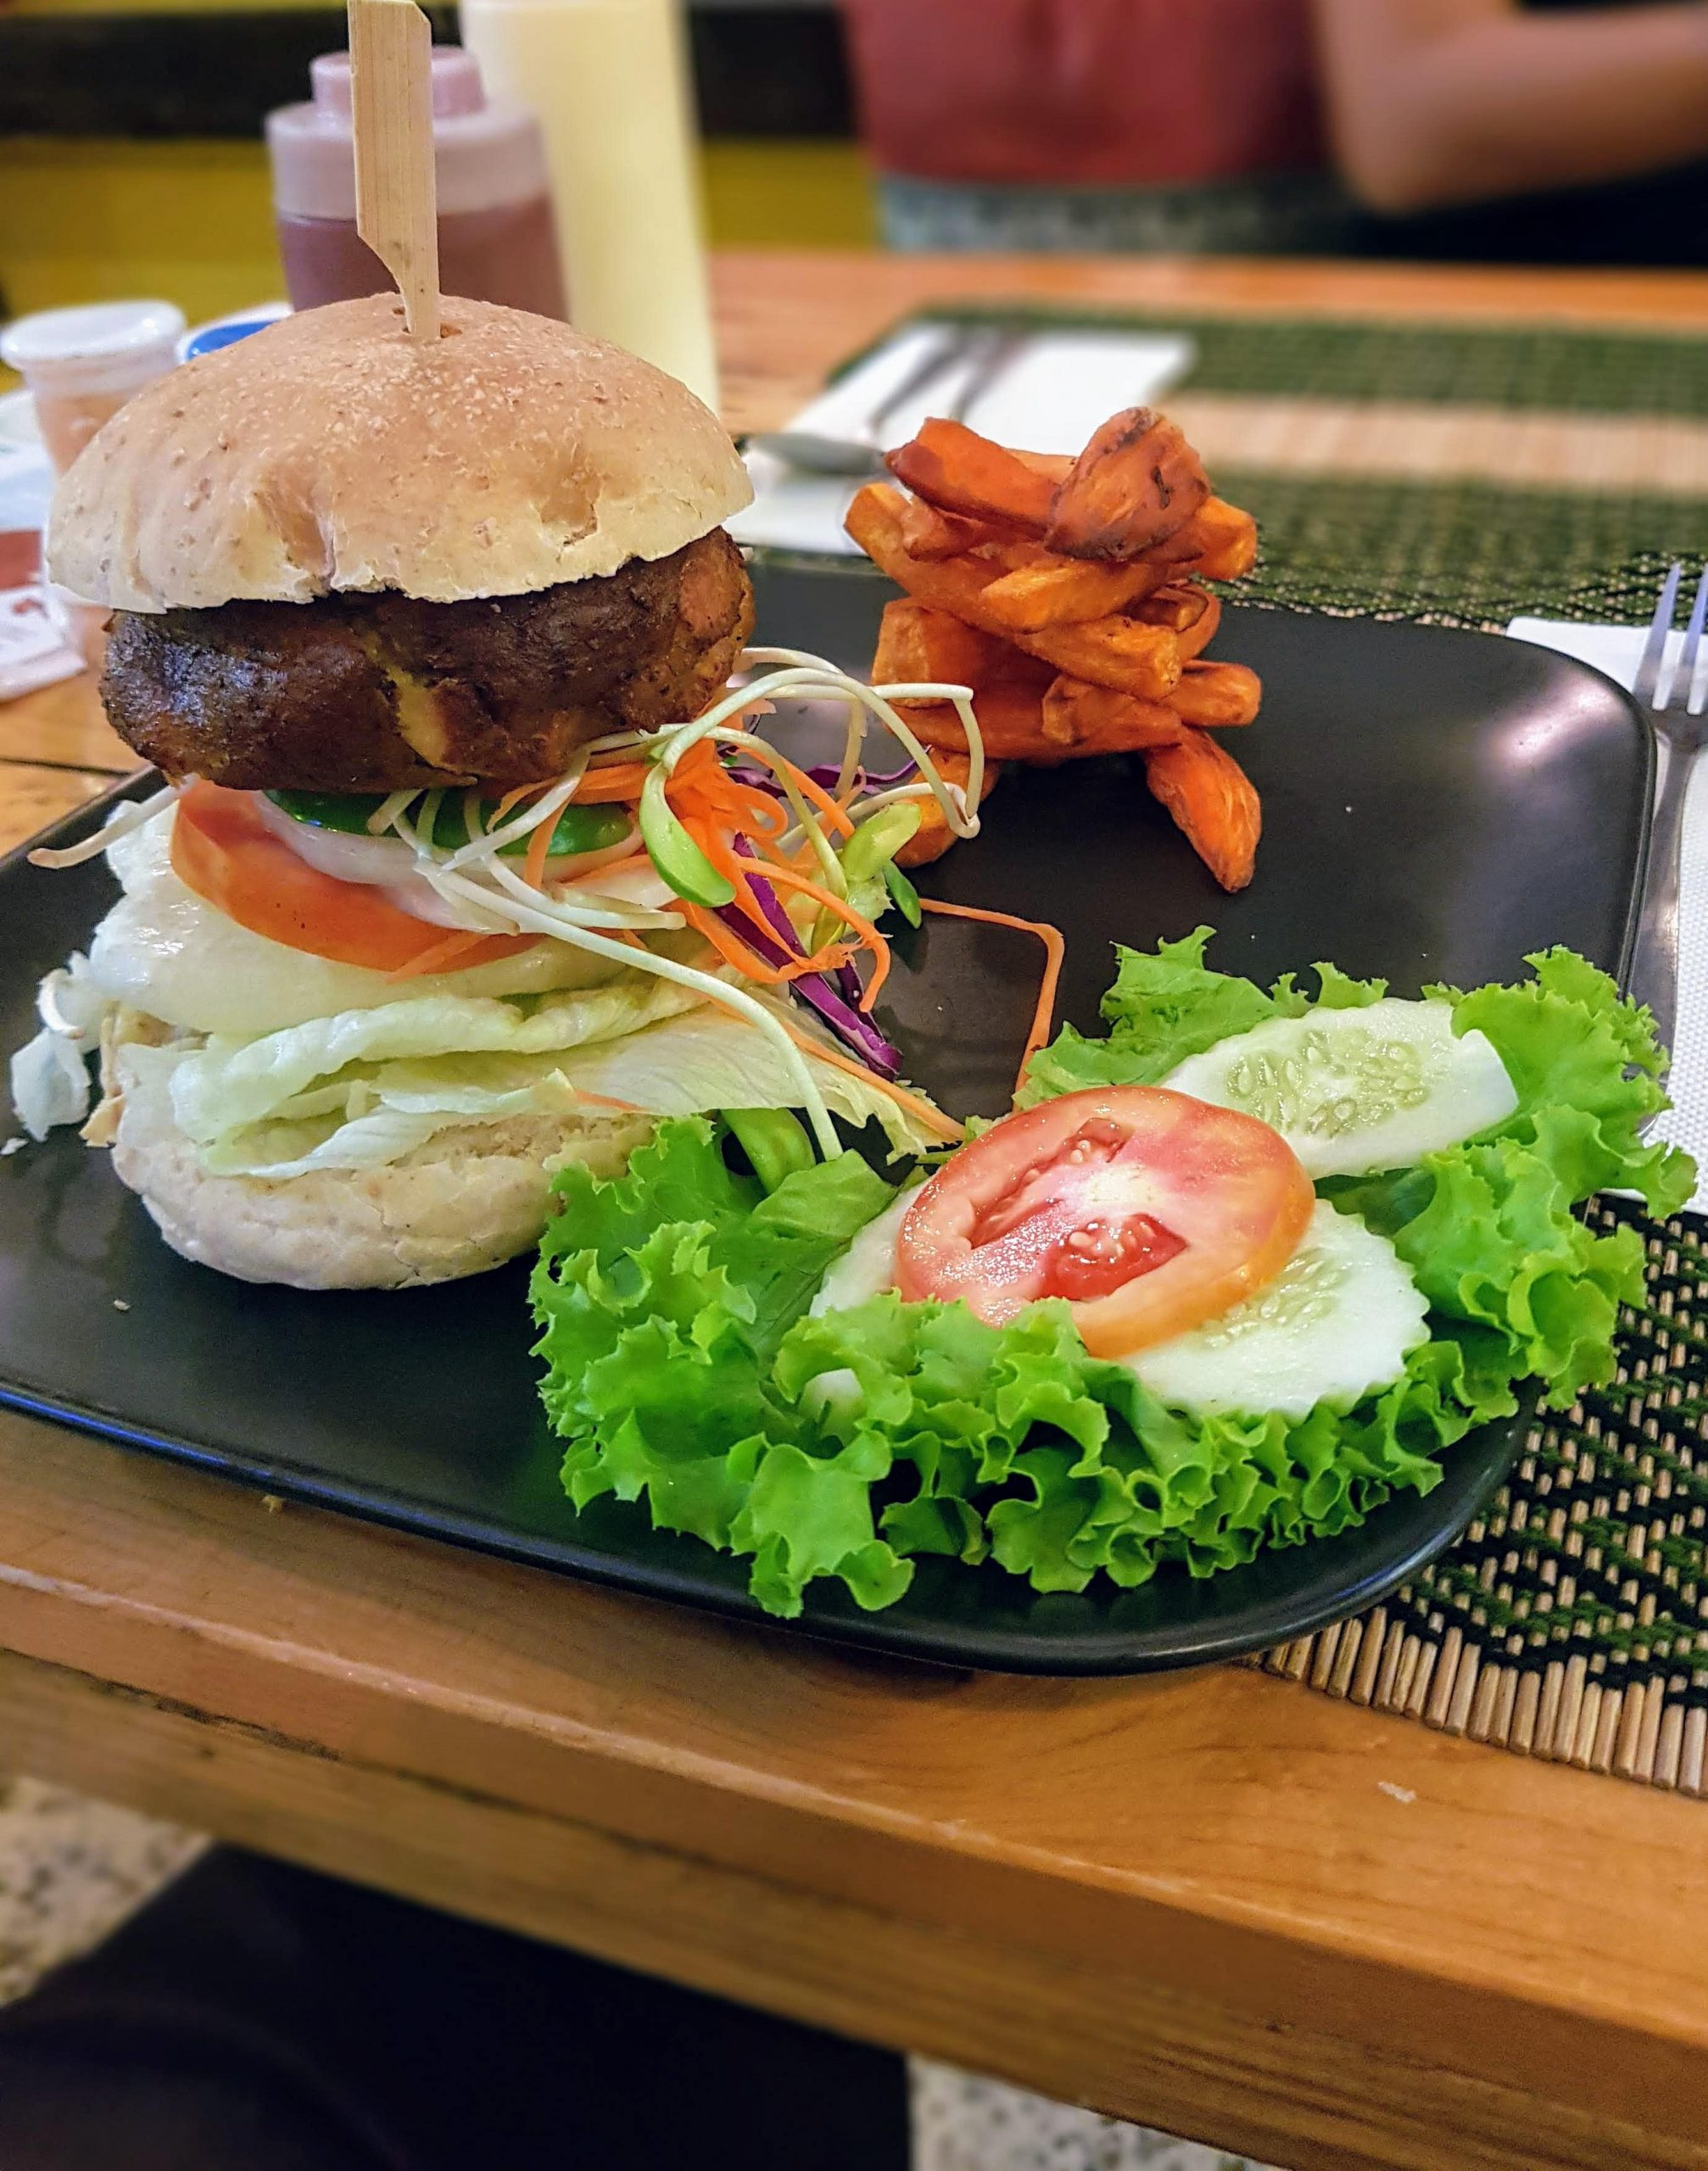 Quinoa burger at Taste From Heaven